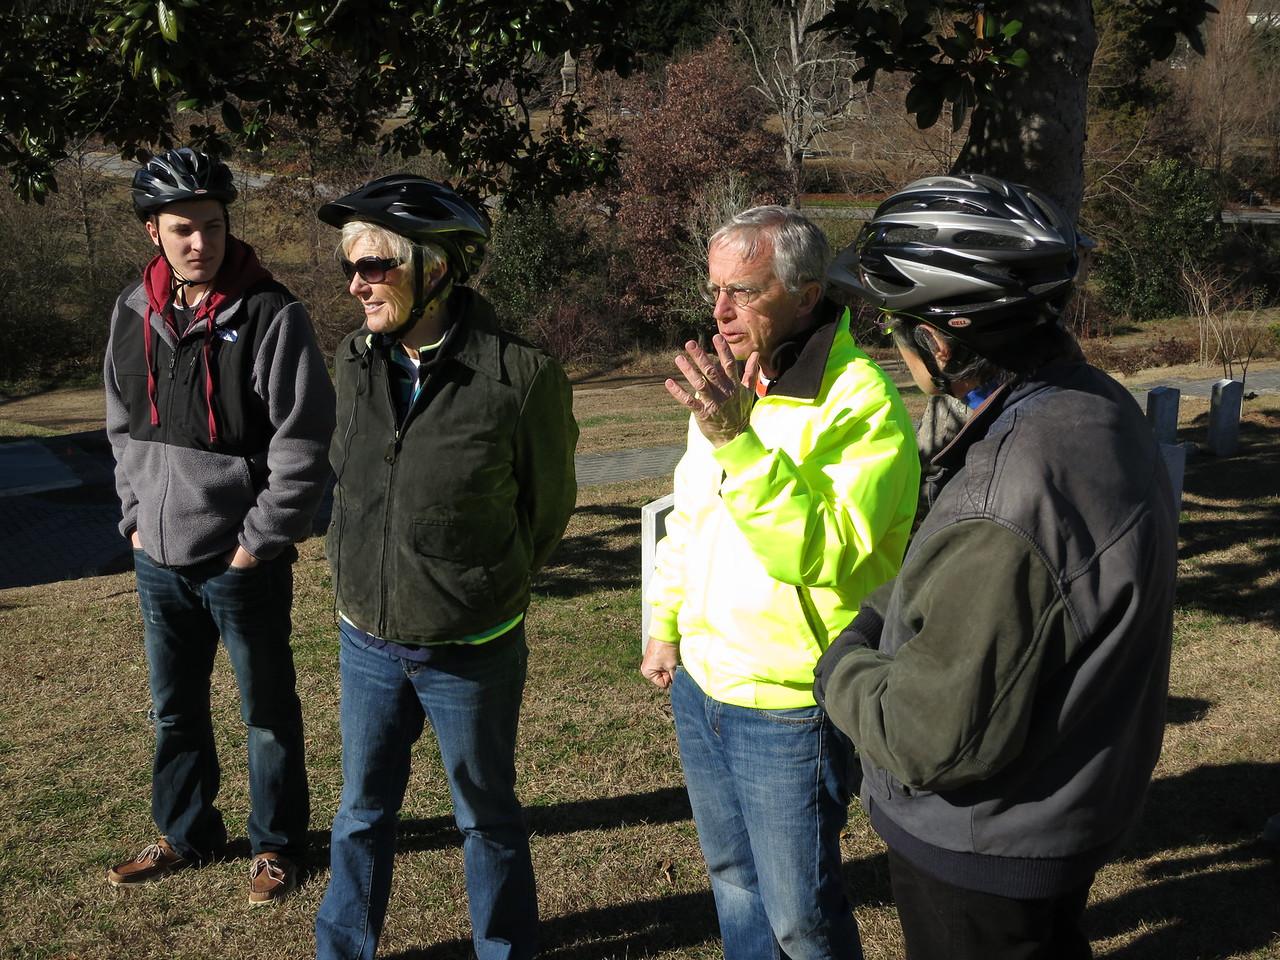 Segway Tour of Oakwood